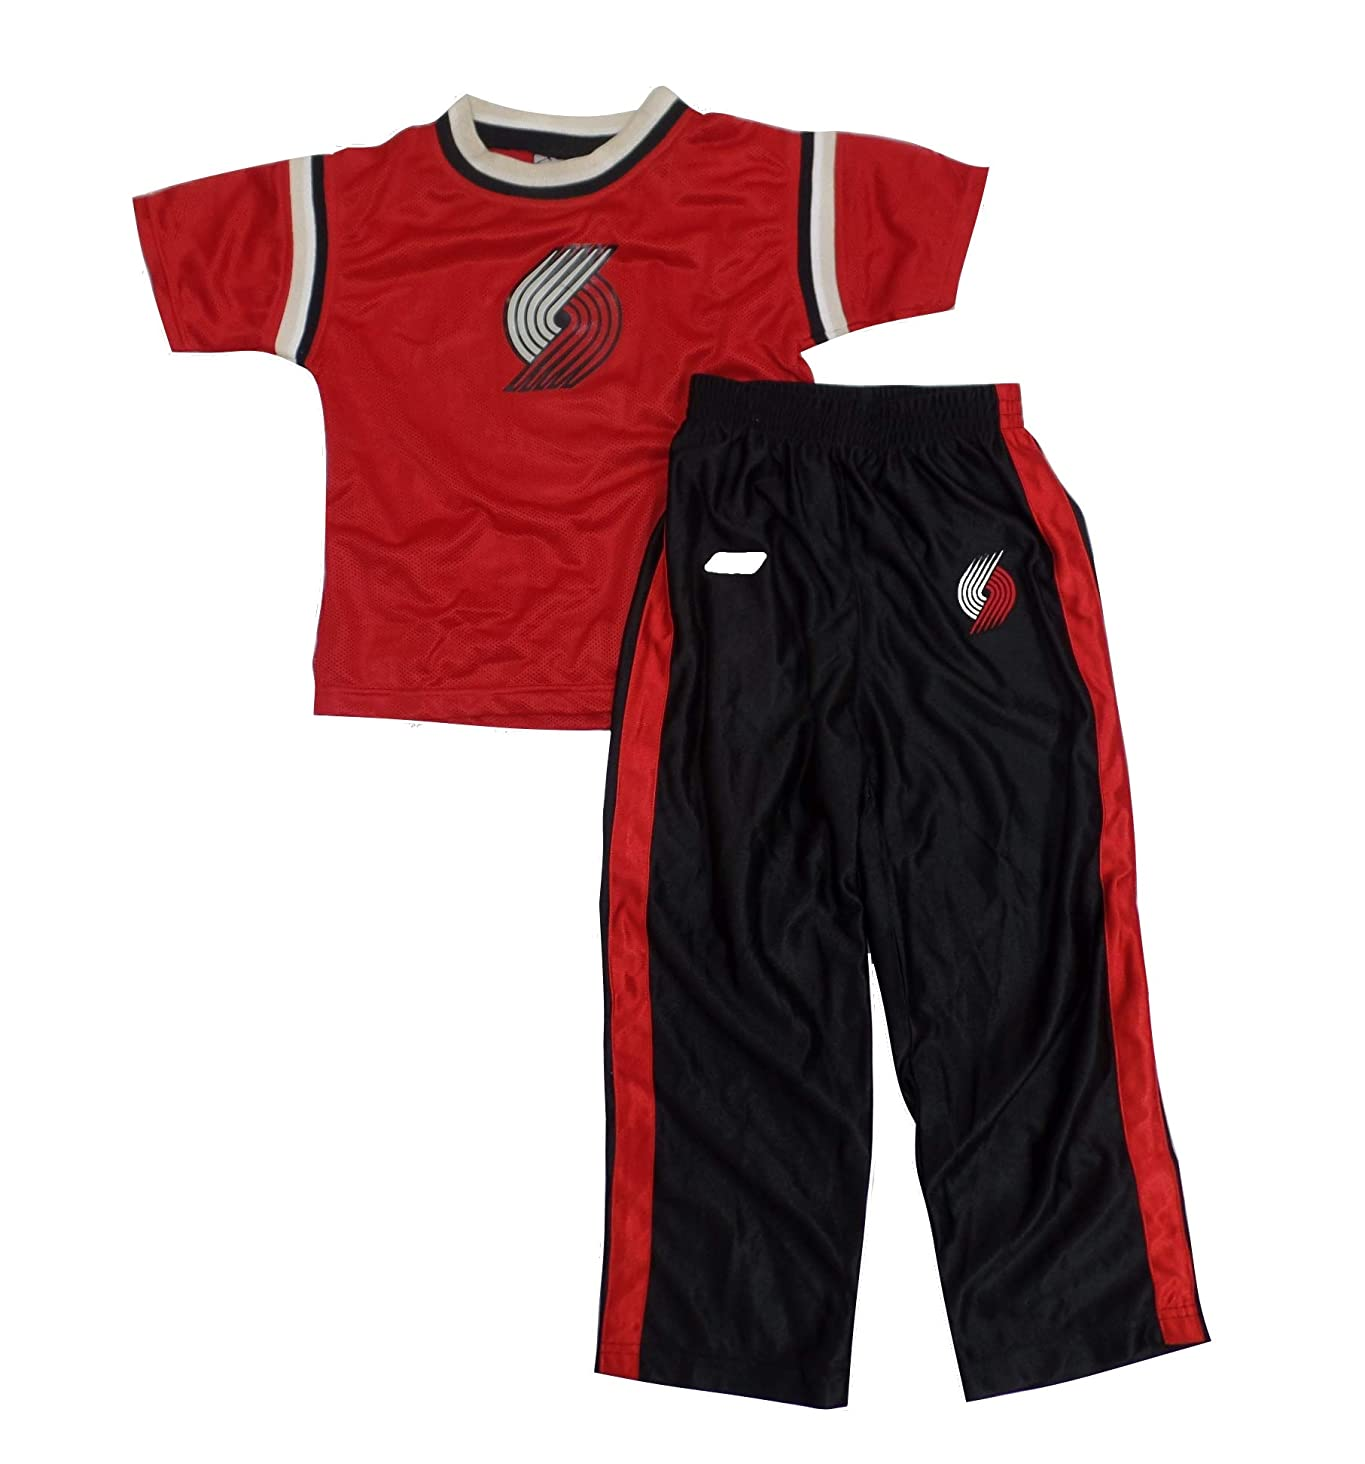 Portland Trail Blazers NBA Kids/Youth Jersey & Pants Set